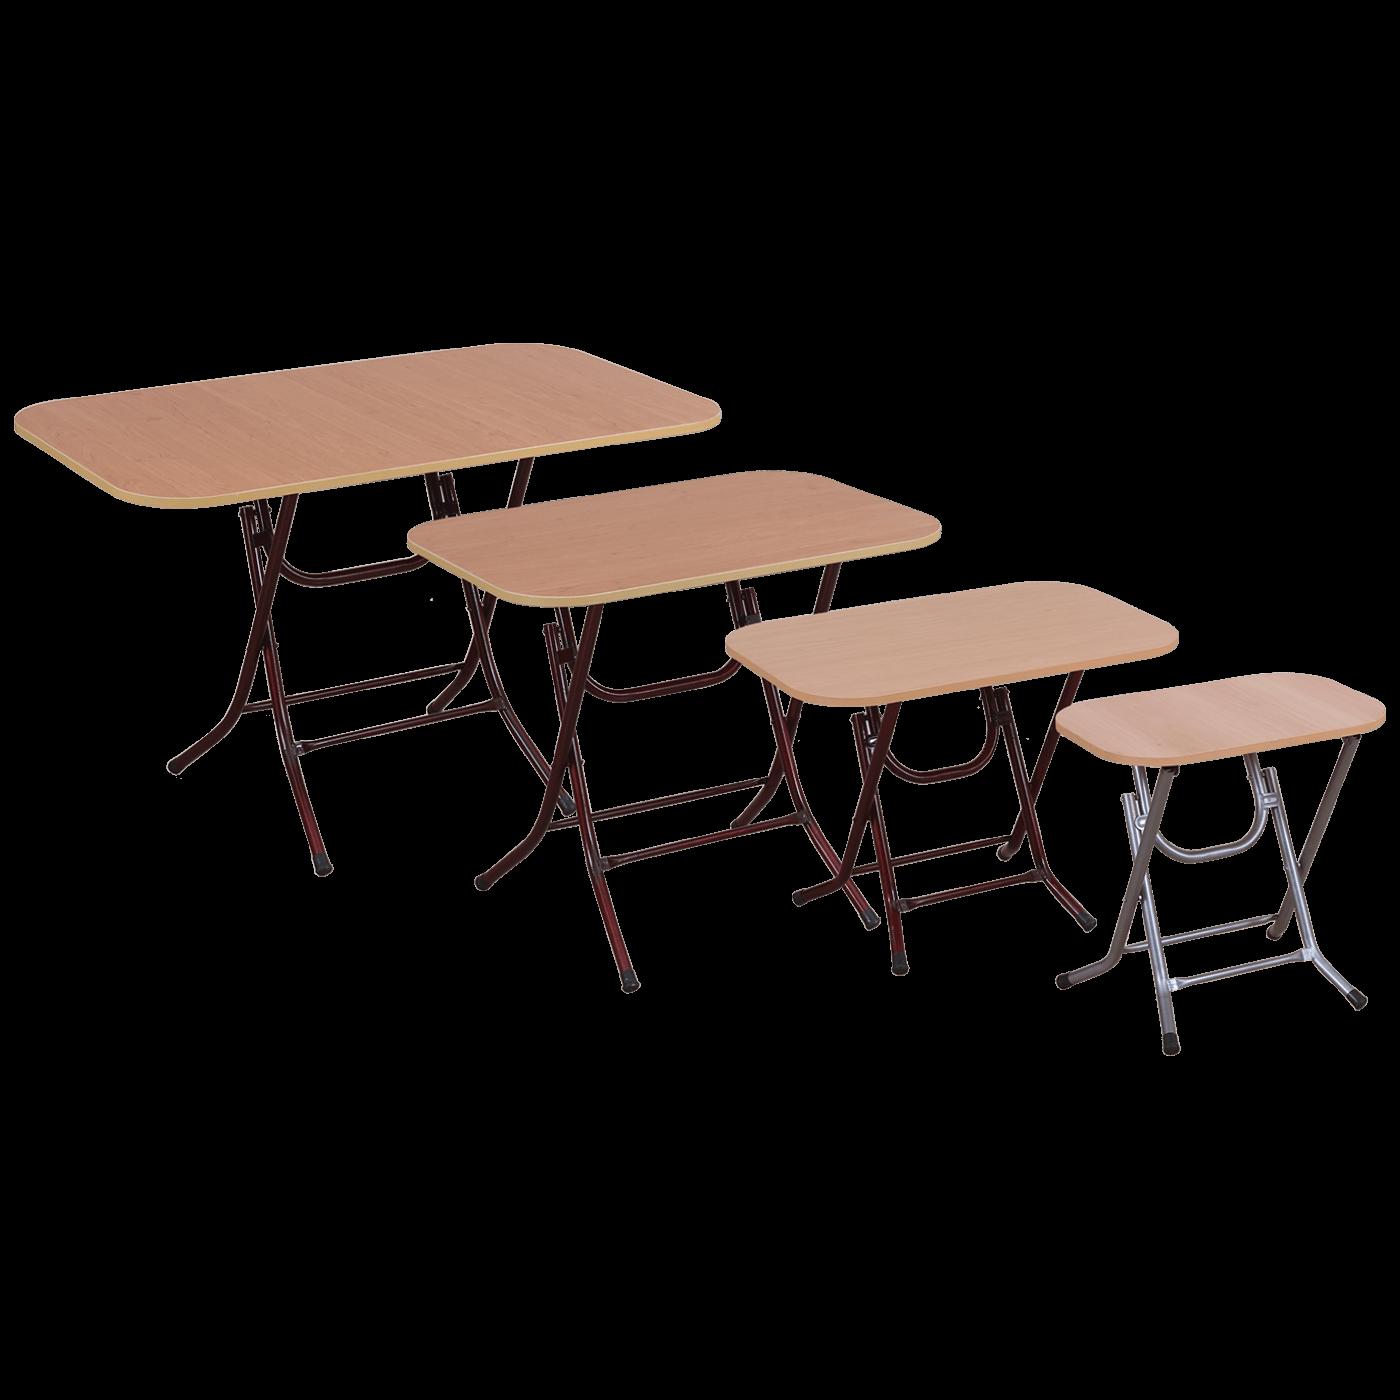 Sklopivi višenamjenski stol, 120x70 cm, visina 75 cm